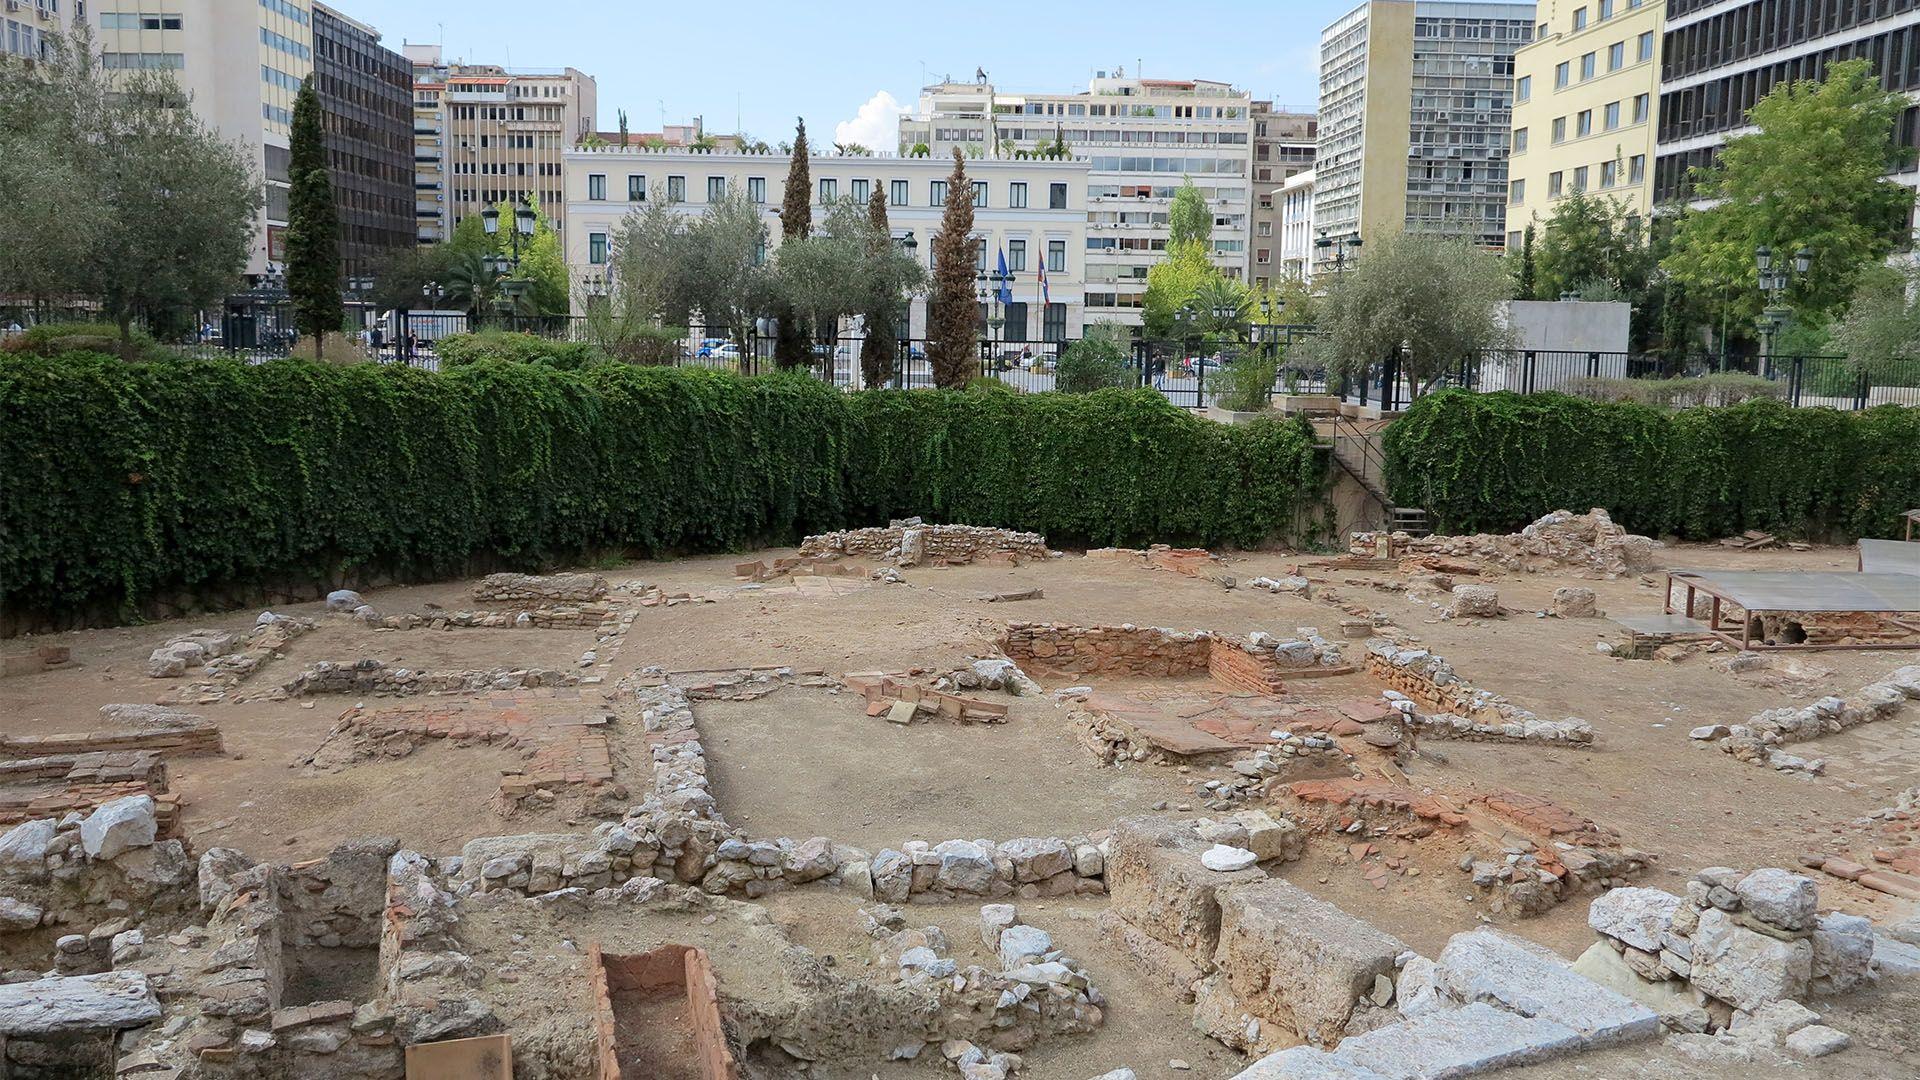 Square Kotzia ancient site Πλατεία Κοτζιά αρχαιολογικός χώρος